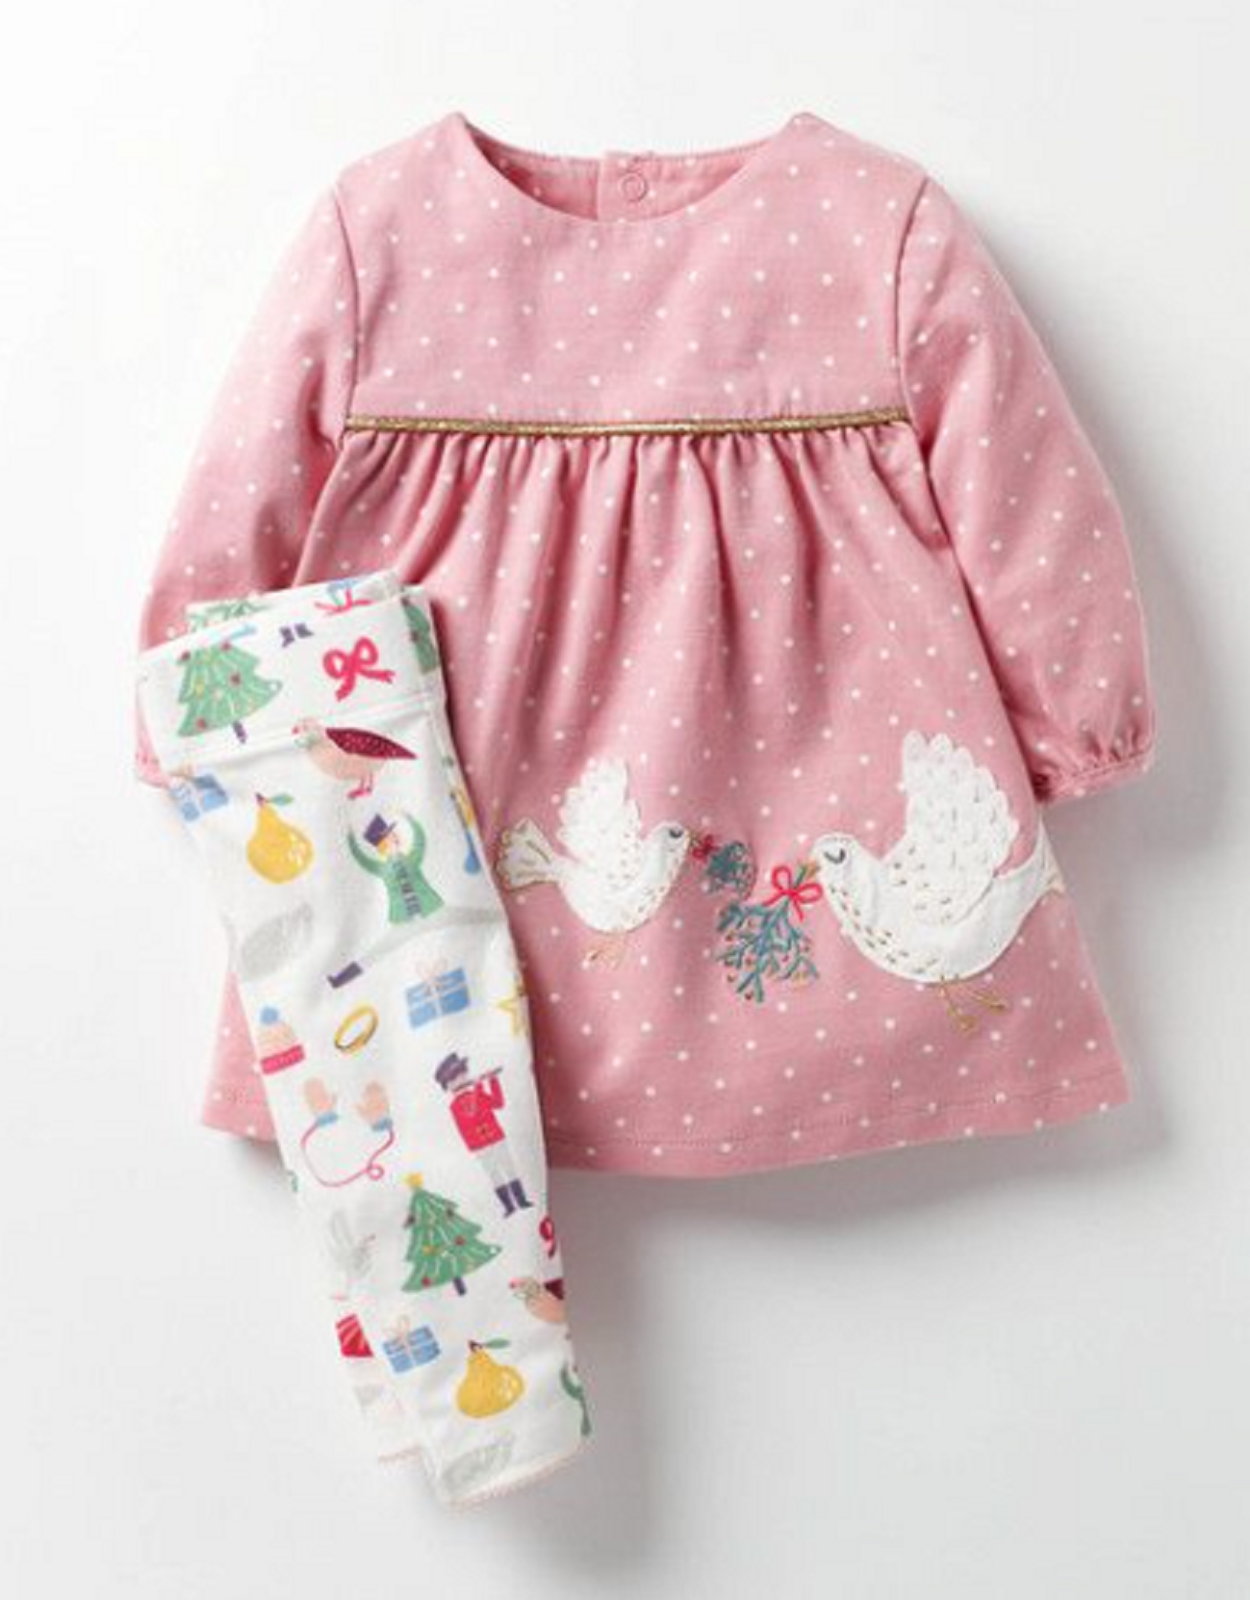 Baby boden girls dress leggings set outfit 0 3 6 9 12 18 mon